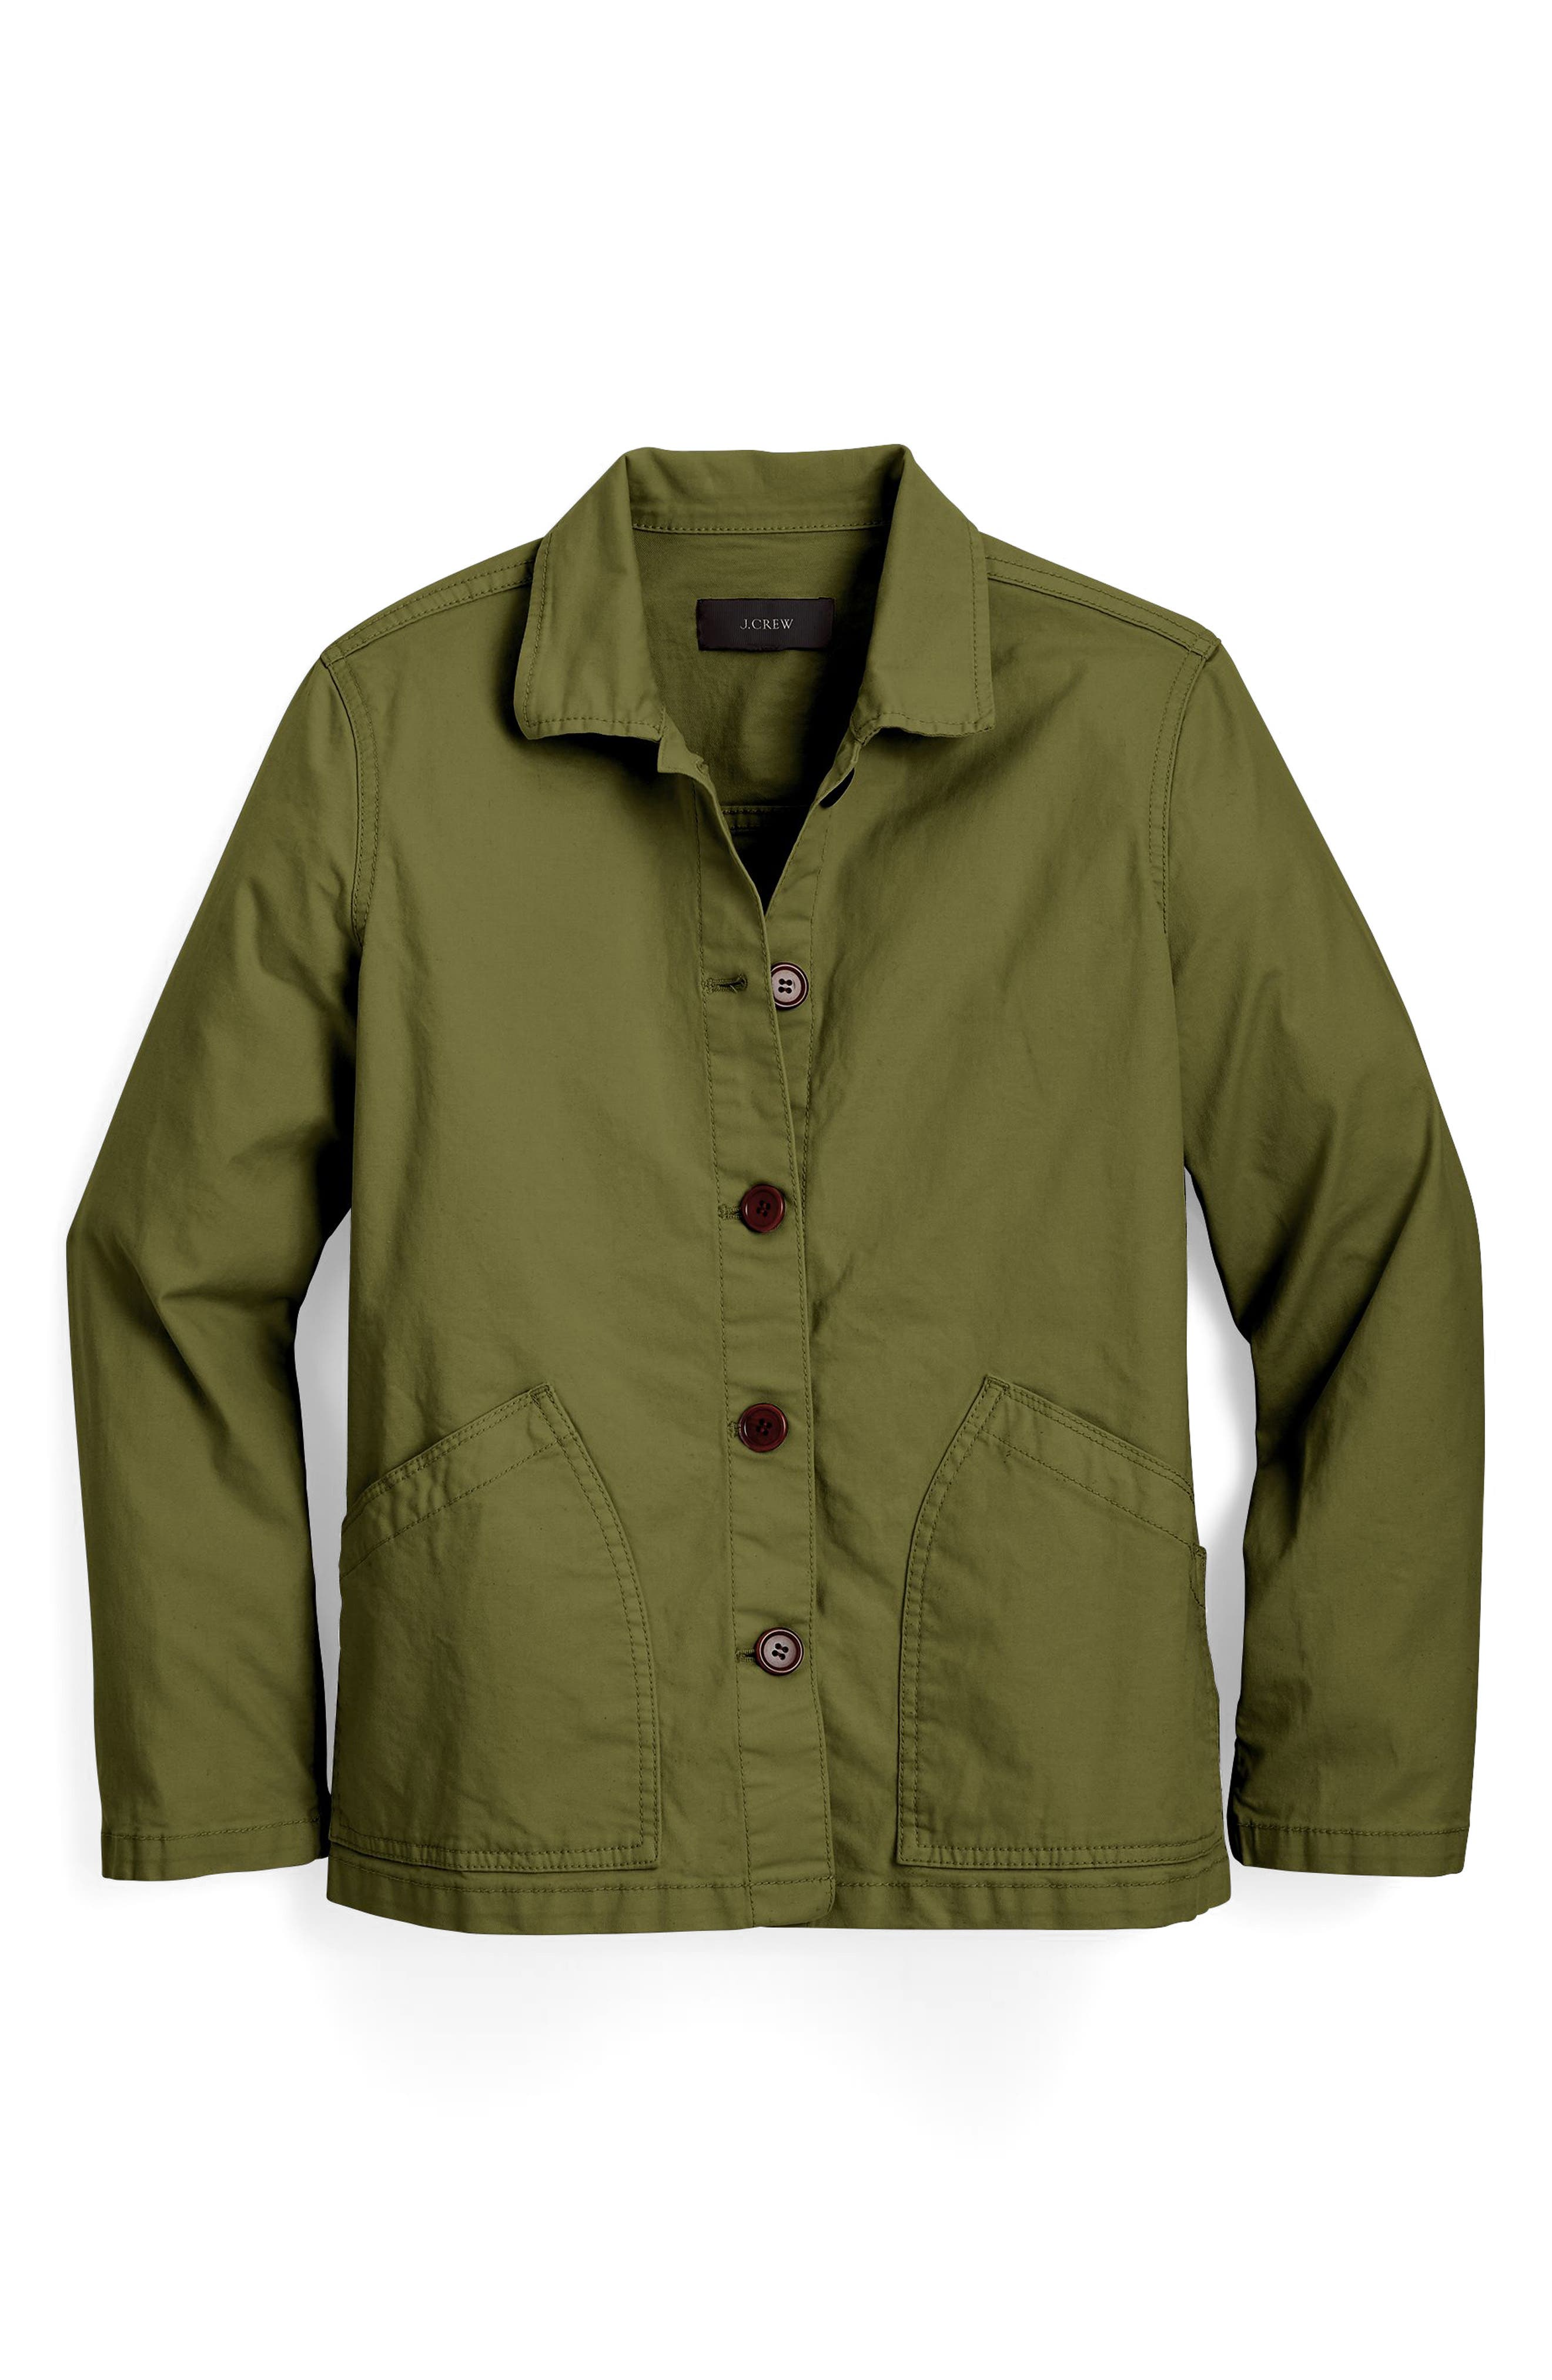 J.Crew Garment Dyed Swing Jacket